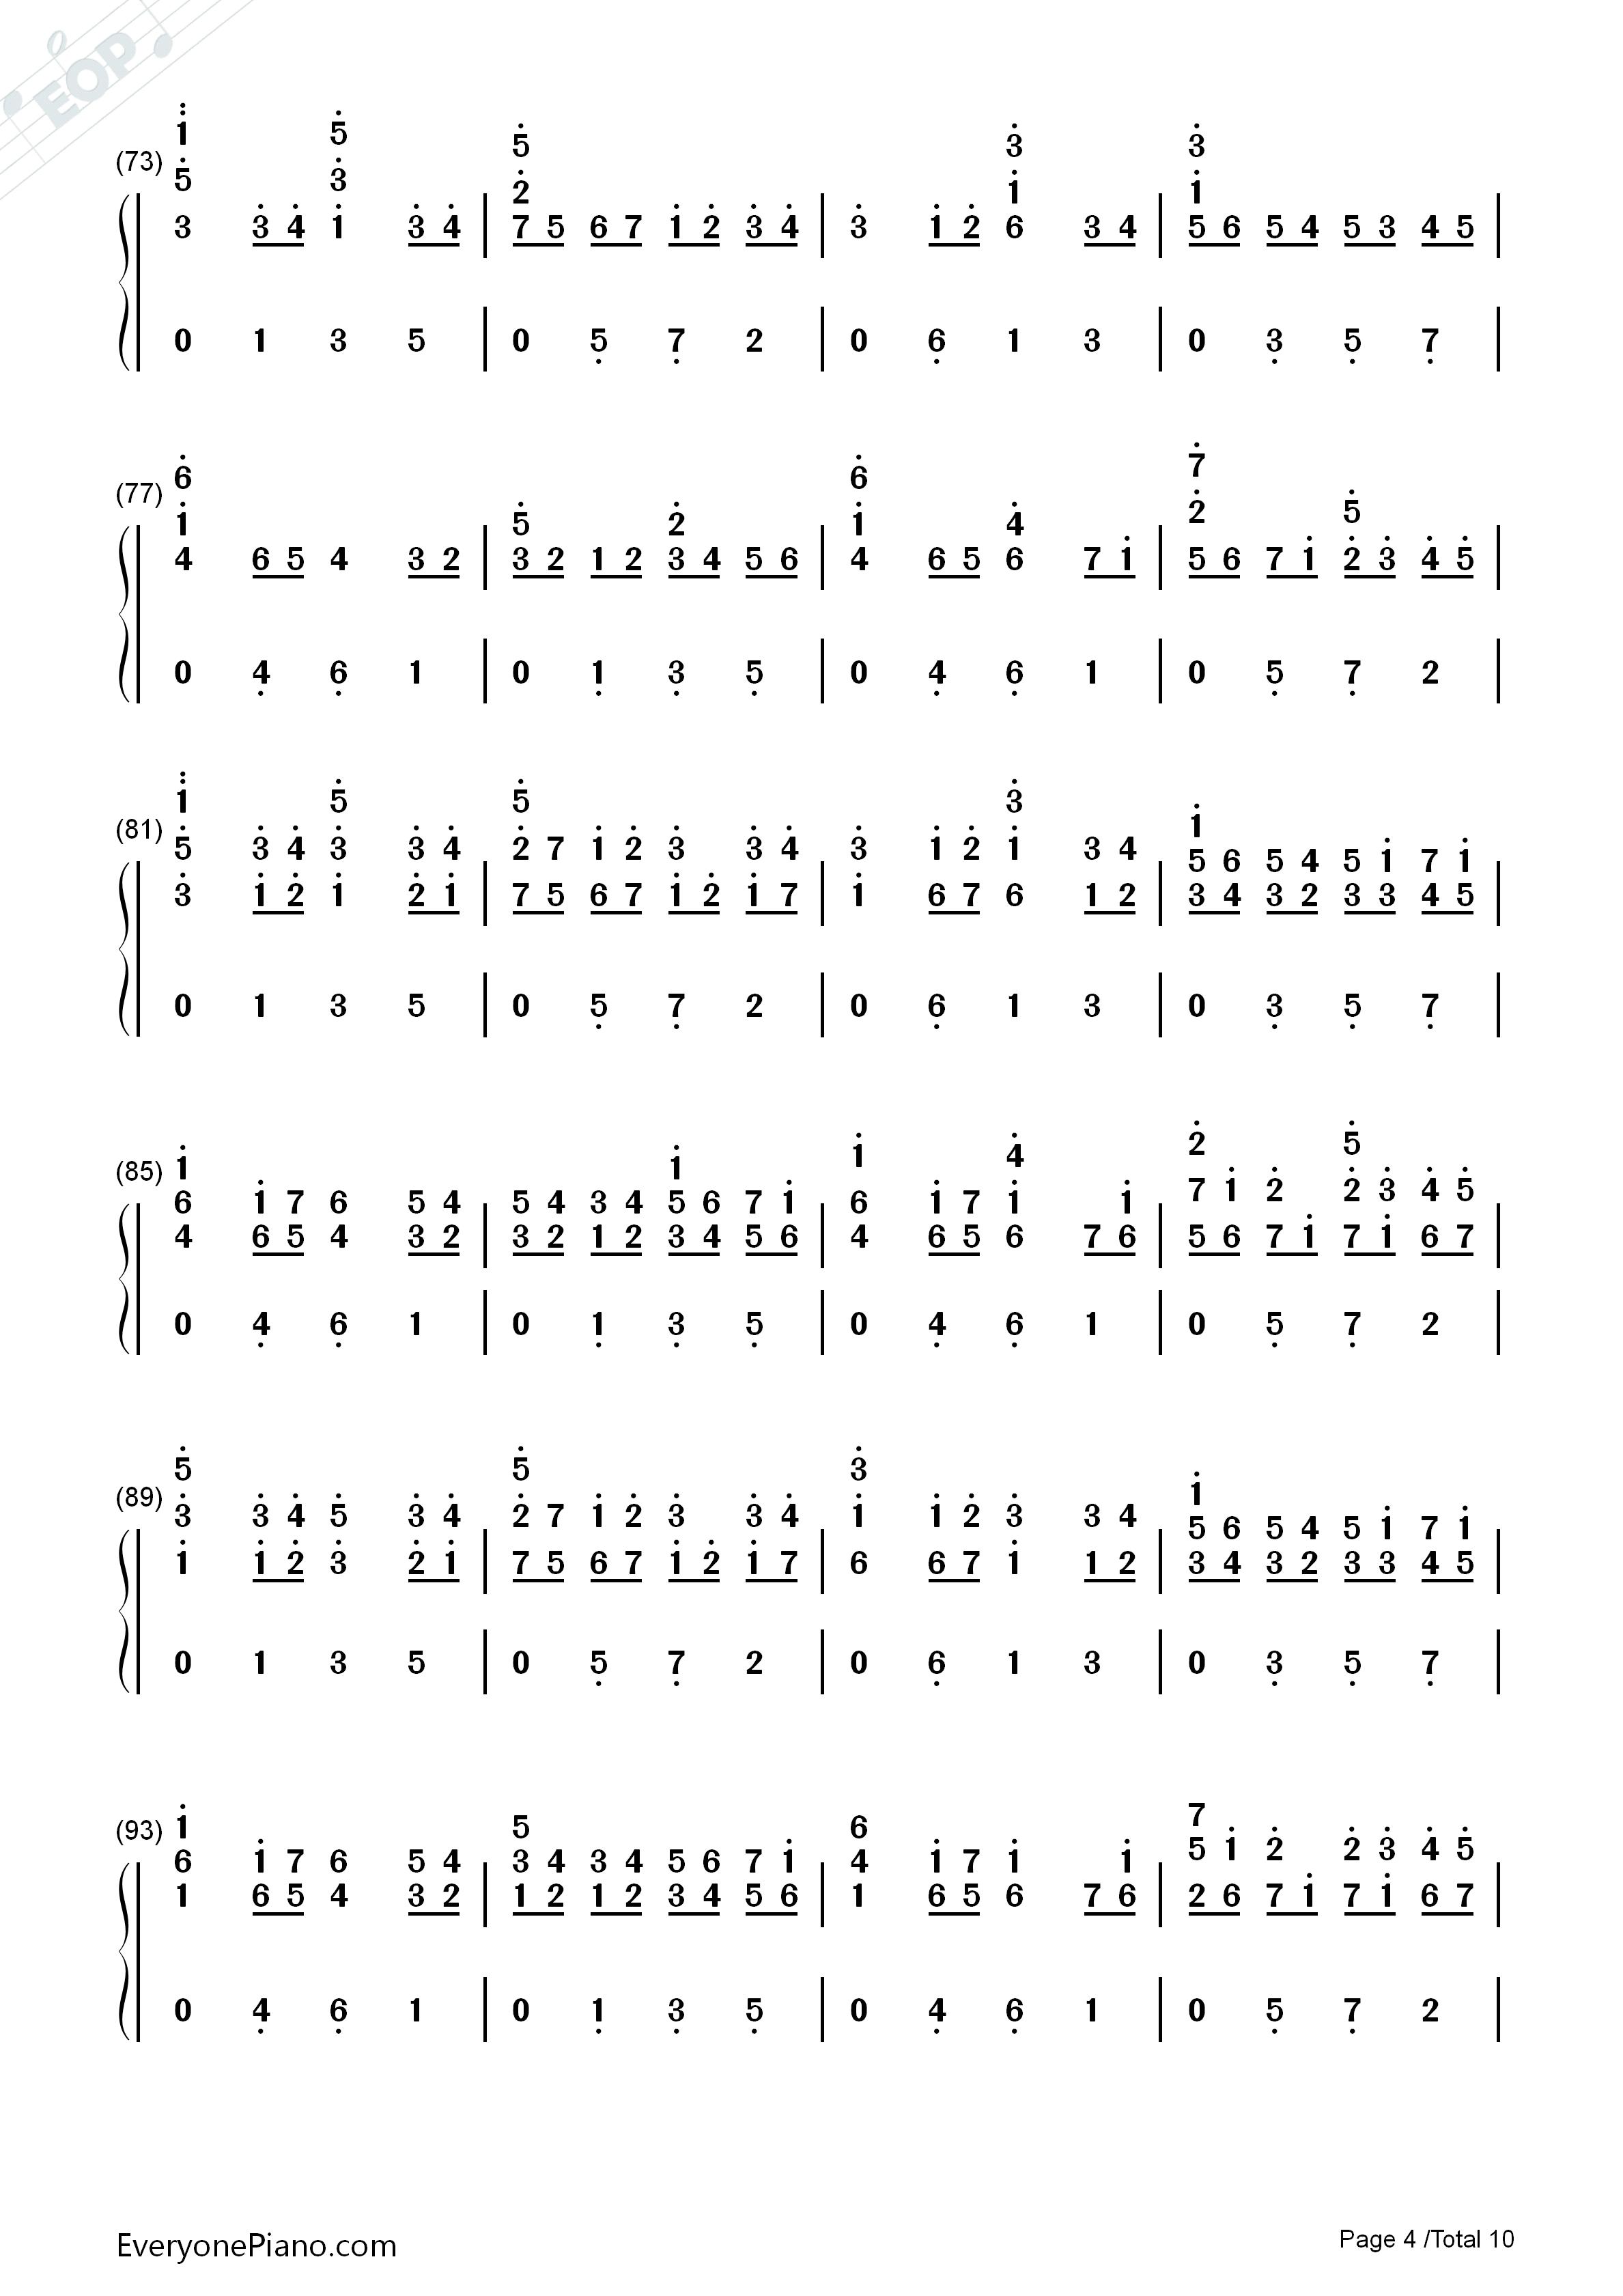 d大调卡农原版-约翰·帕赫贝尔双手简谱预览4-钢琴谱